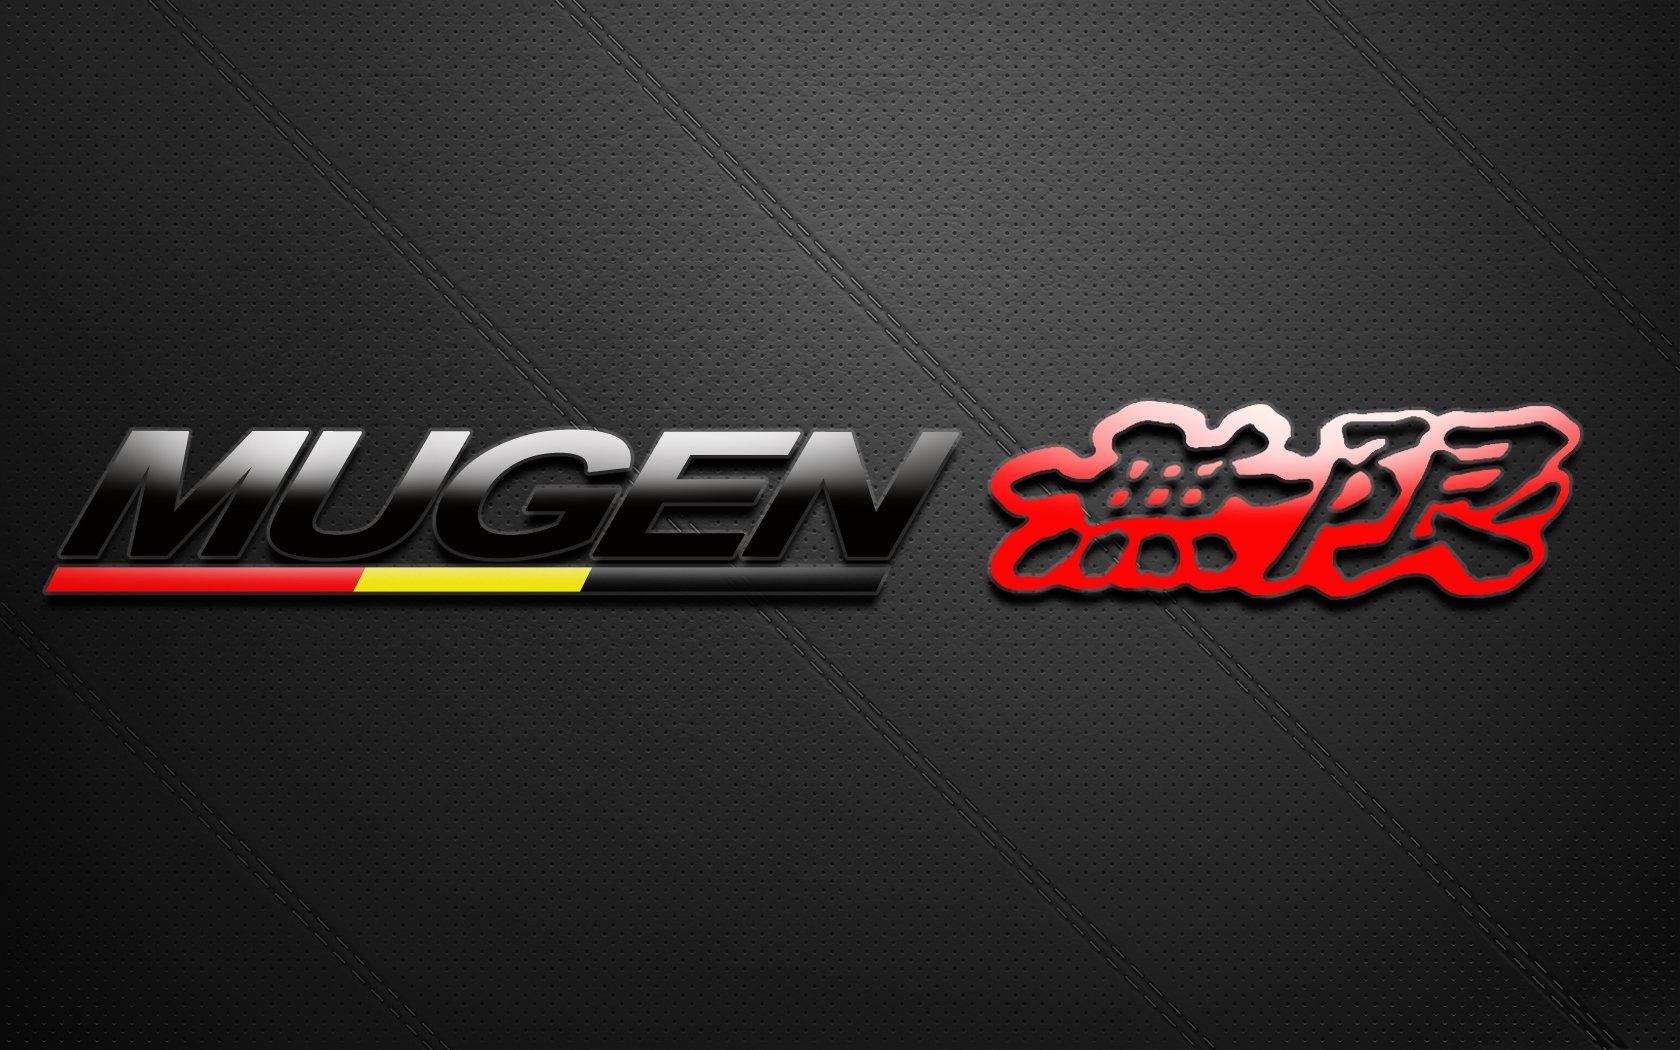 Mugen logo wallpaper honda by traz0x 1680x1050